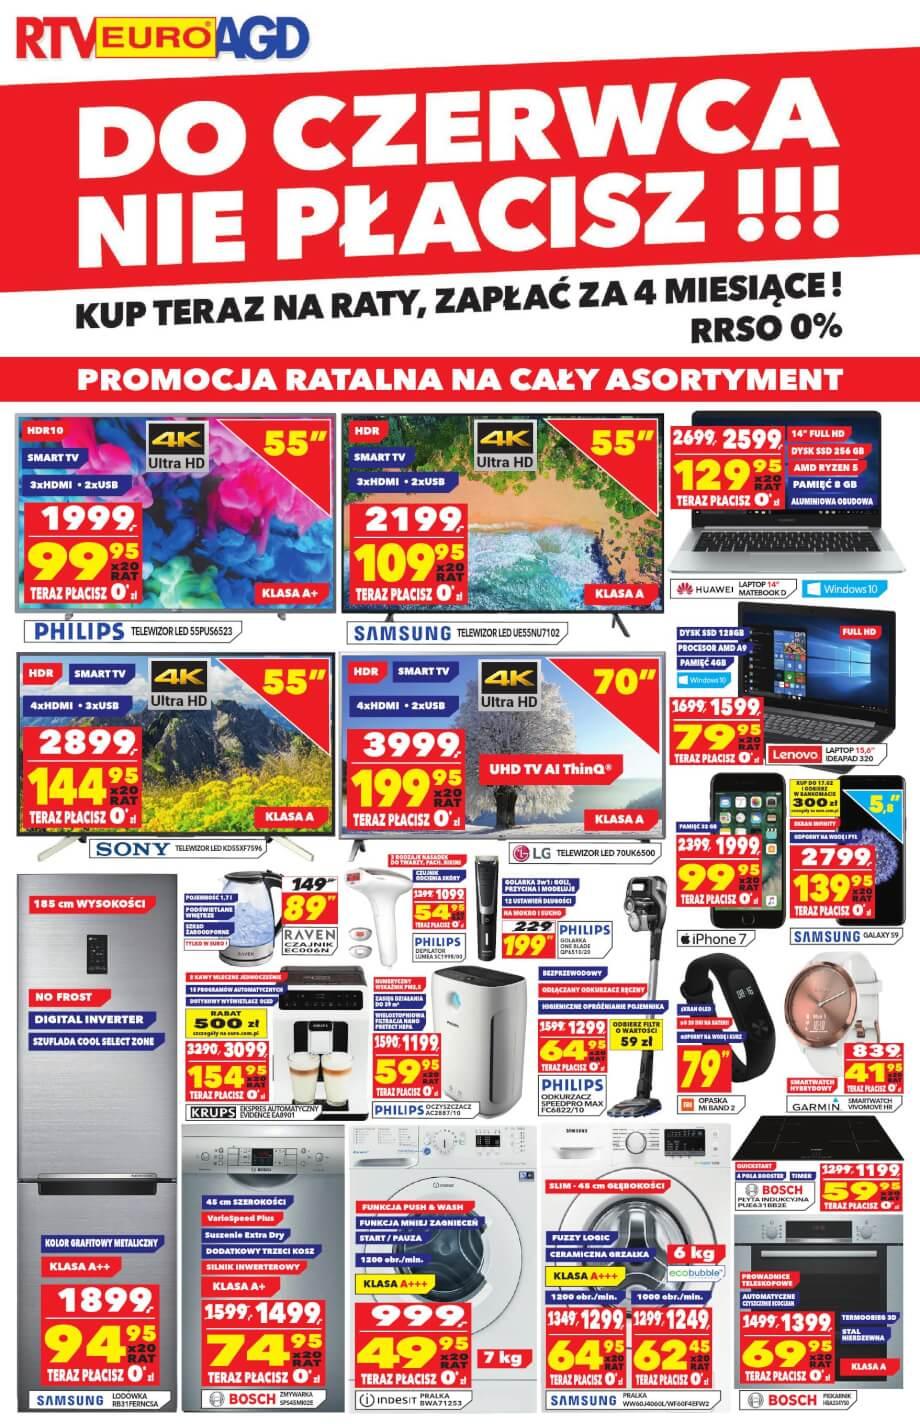 RTV Euro AGD, gazetka do 28.02.2019